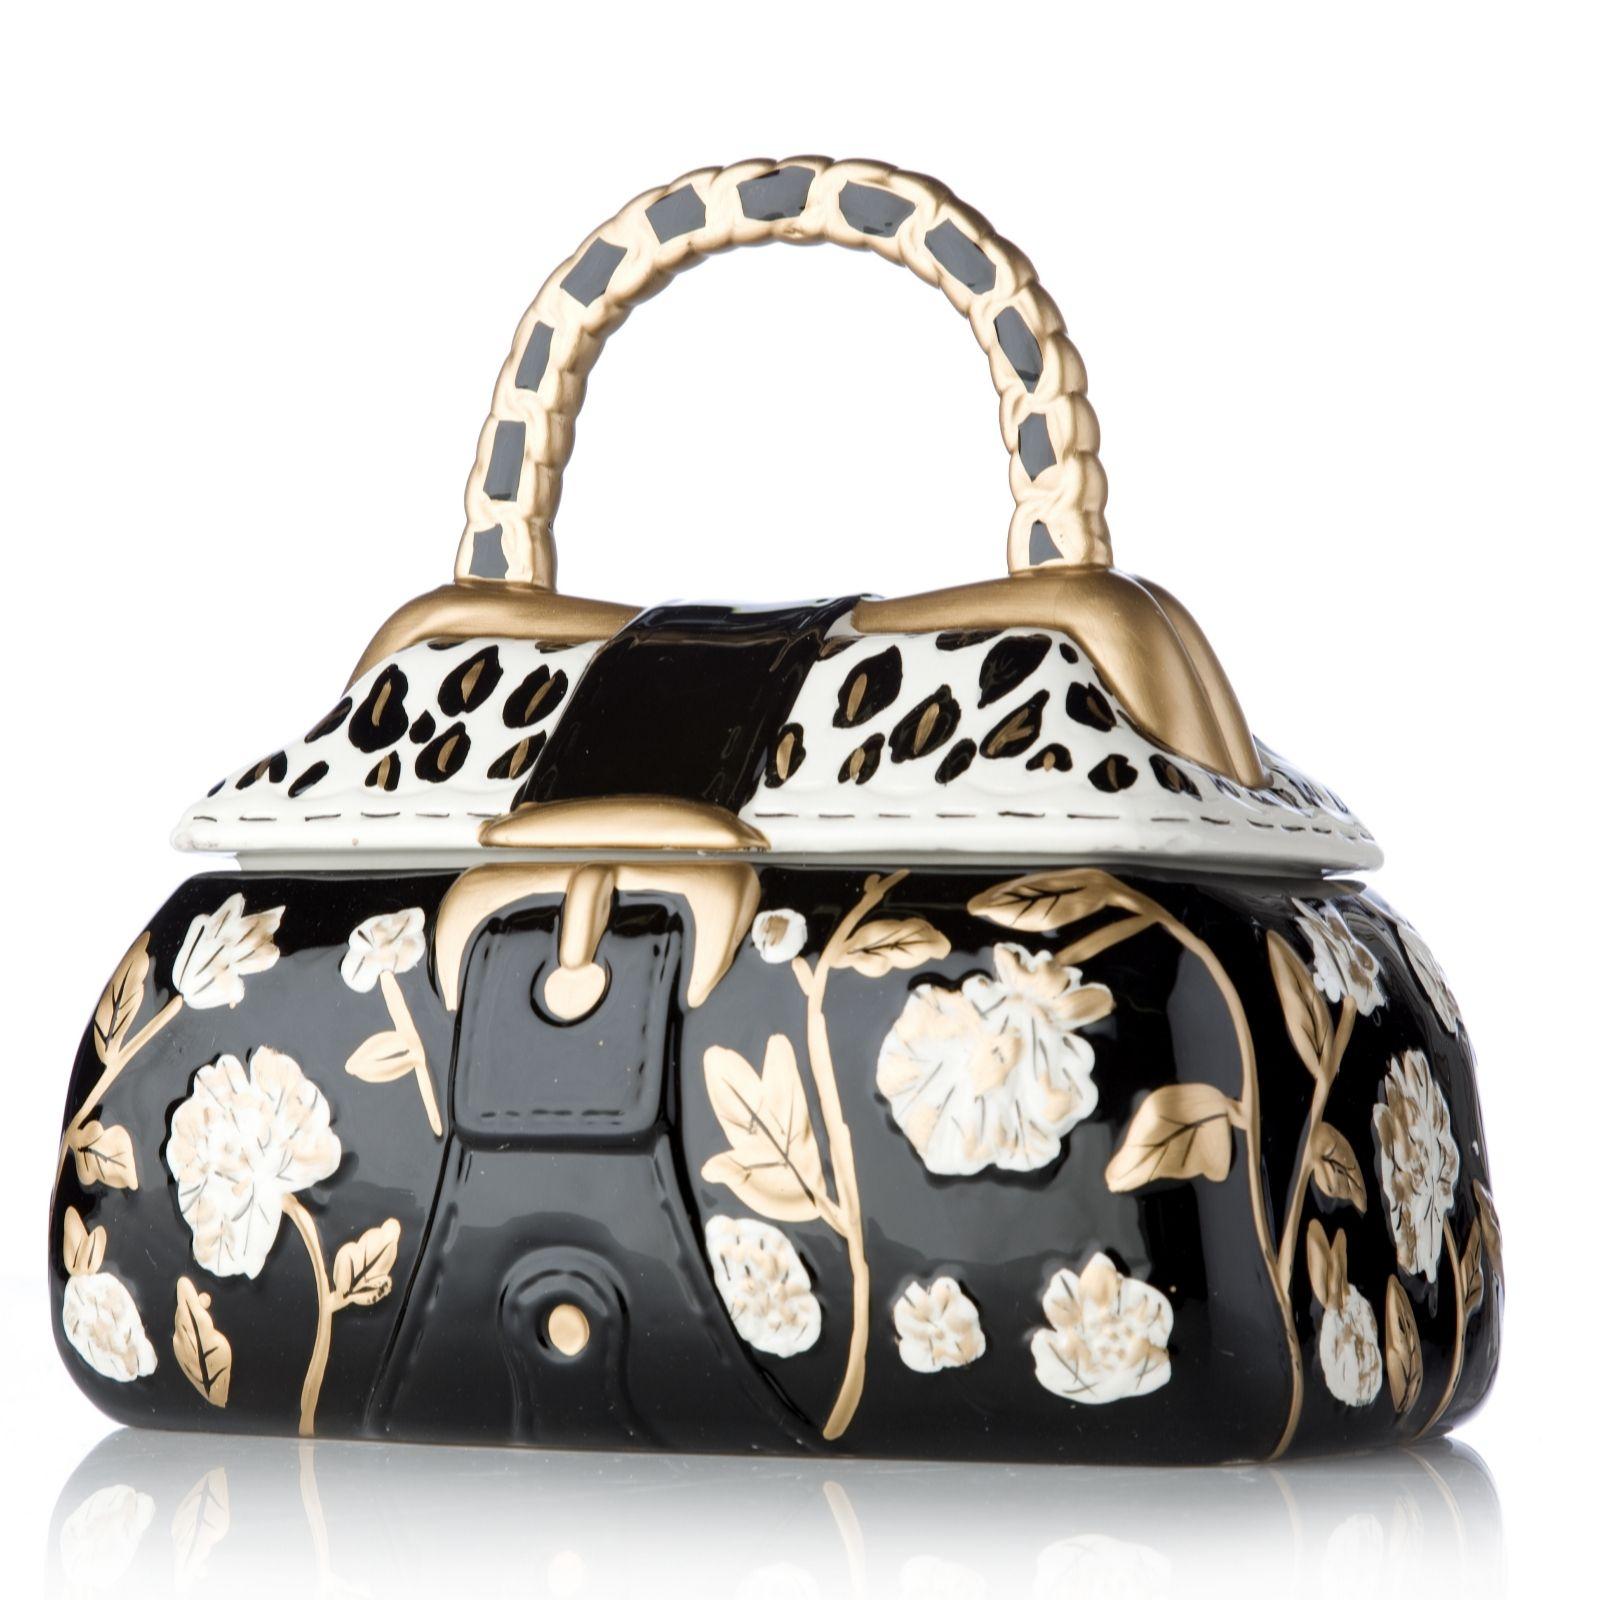 Adina Hand Painted Ceramic Handbag Cookie Jar Qvc Uk